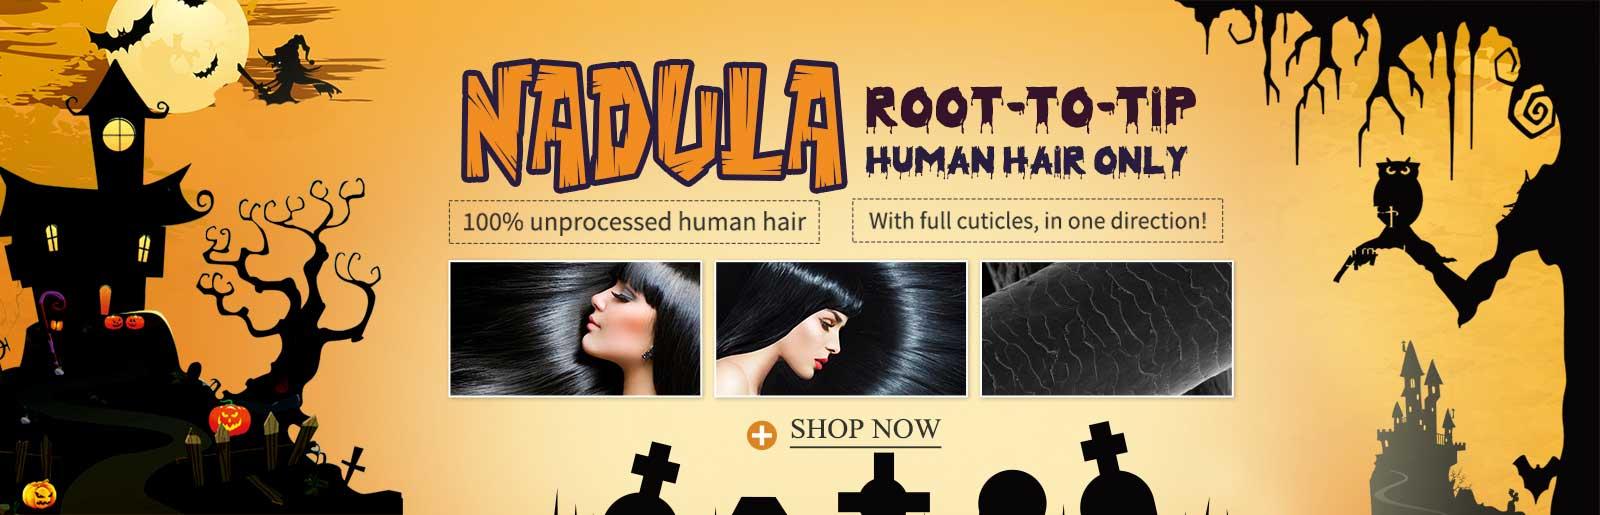 full cuticle in one direction virgin brazilian human hair